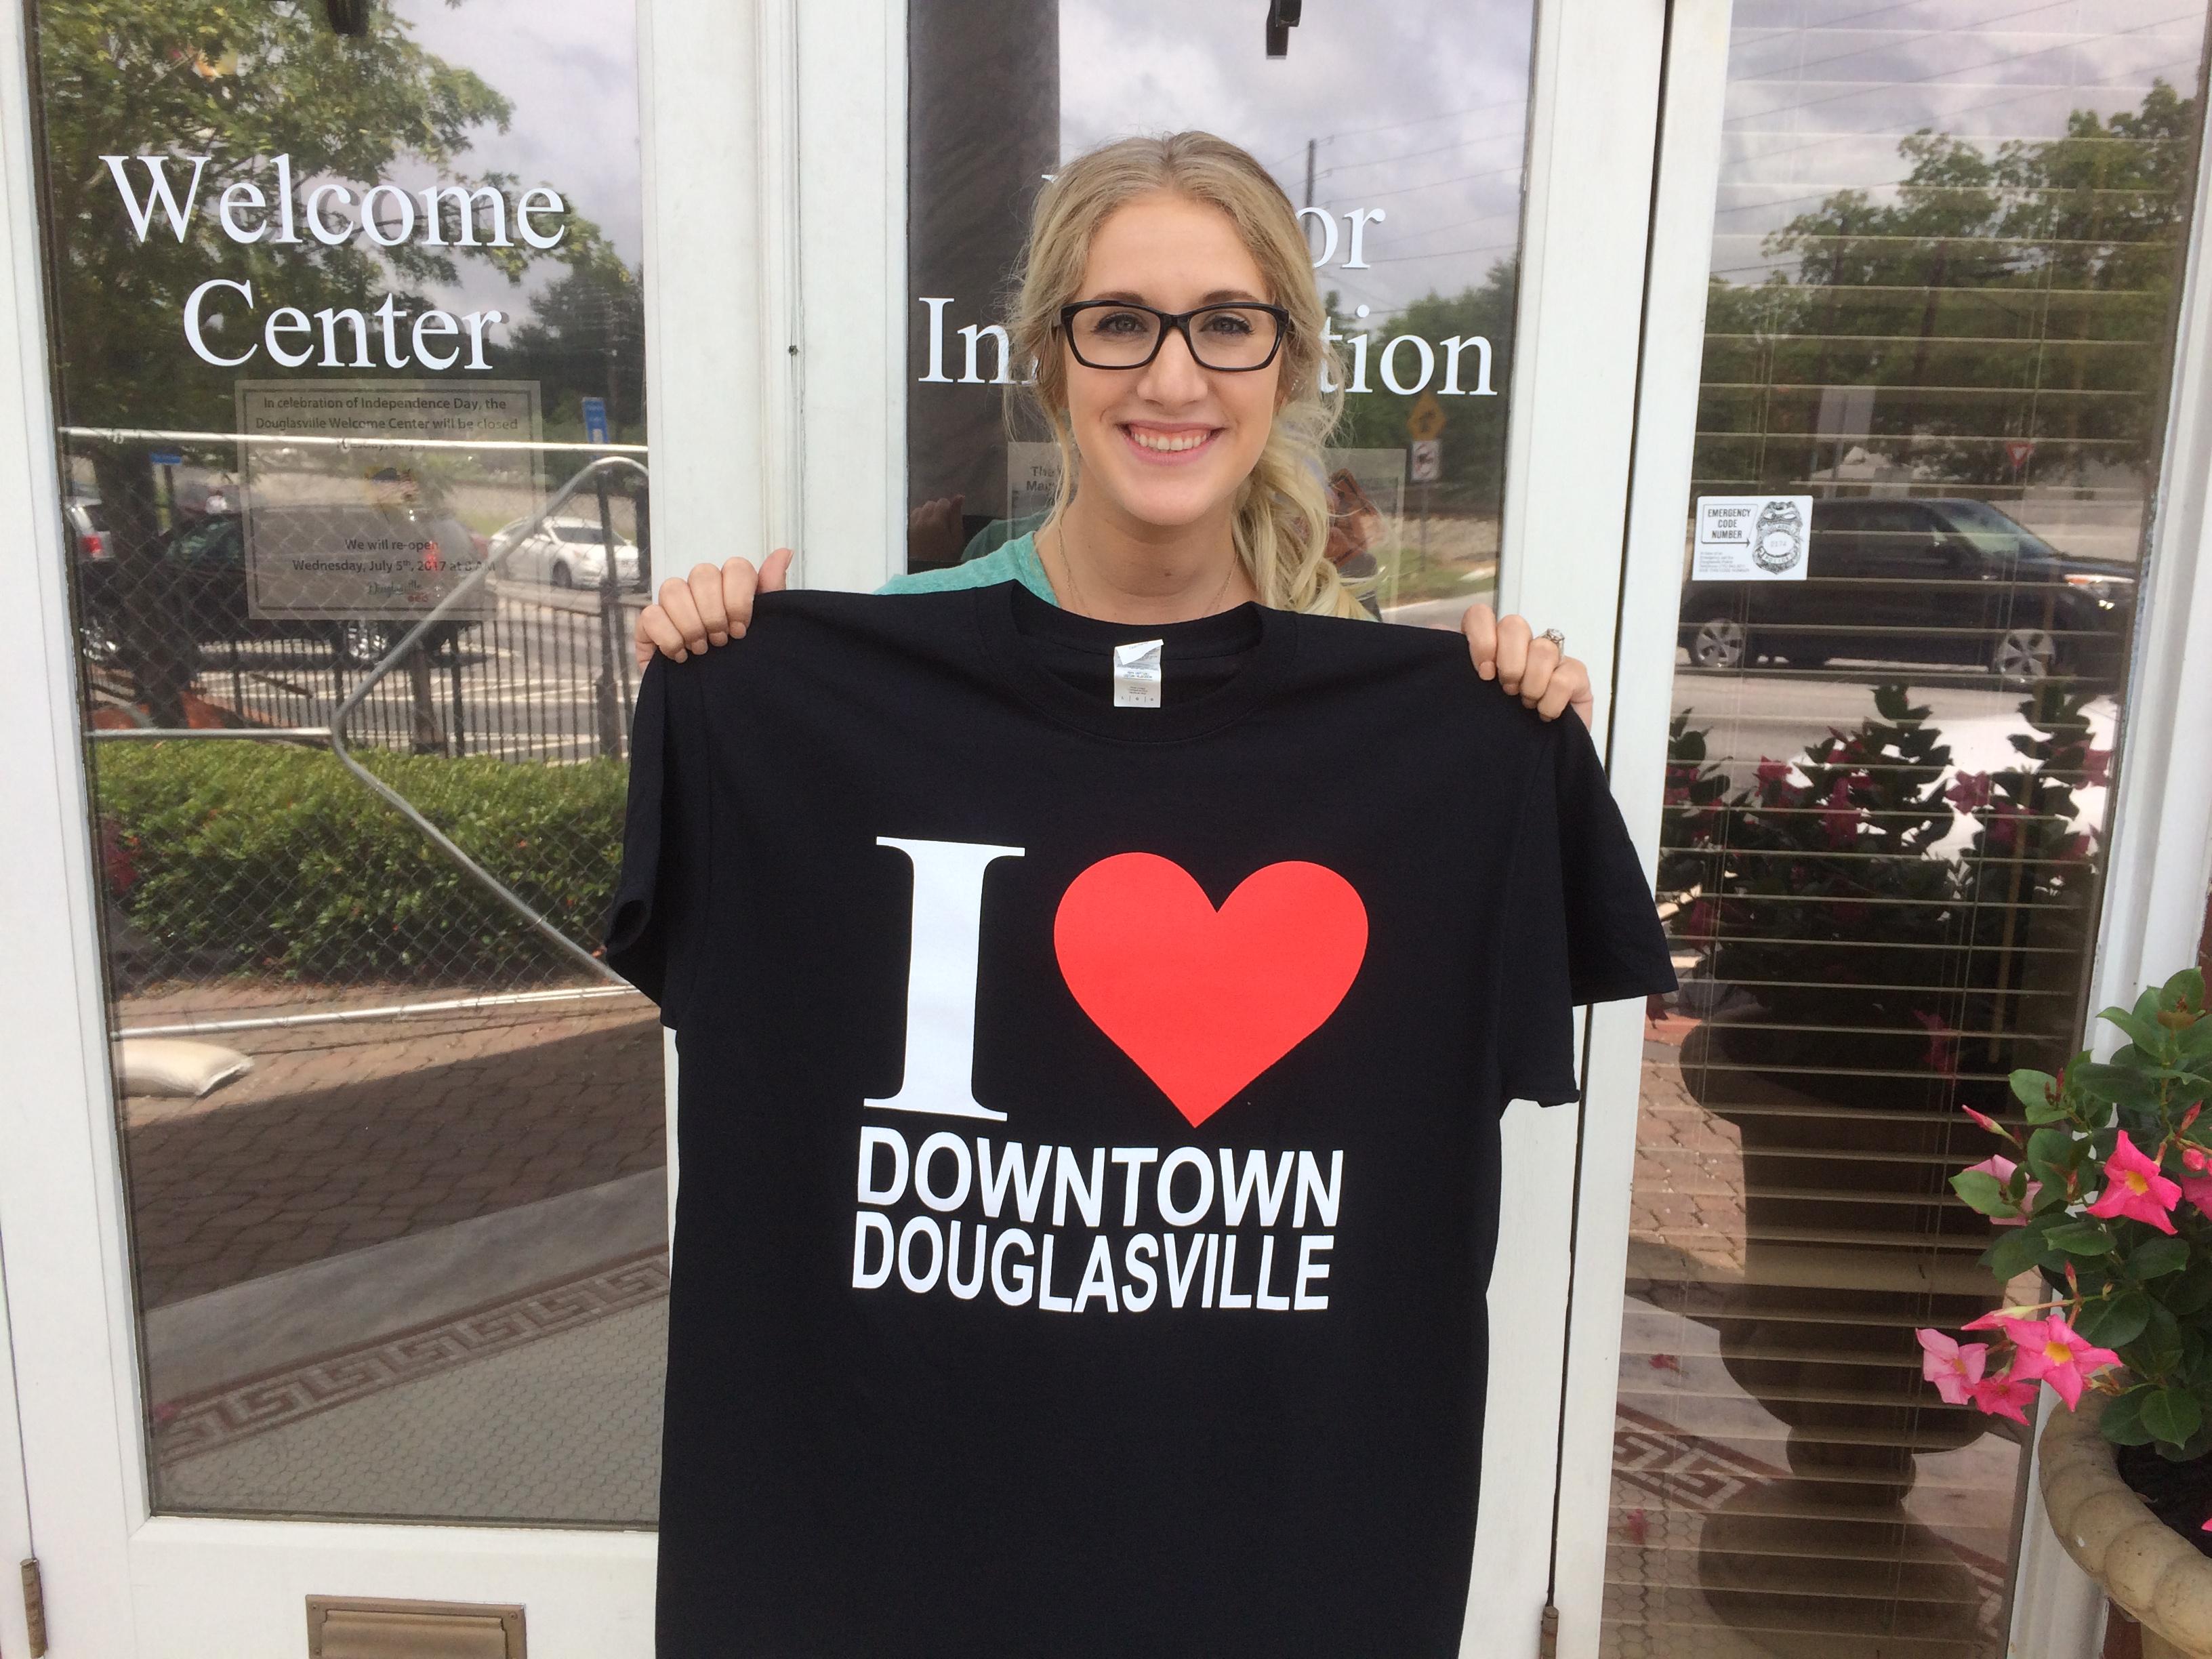 Douglasville T-Shirts